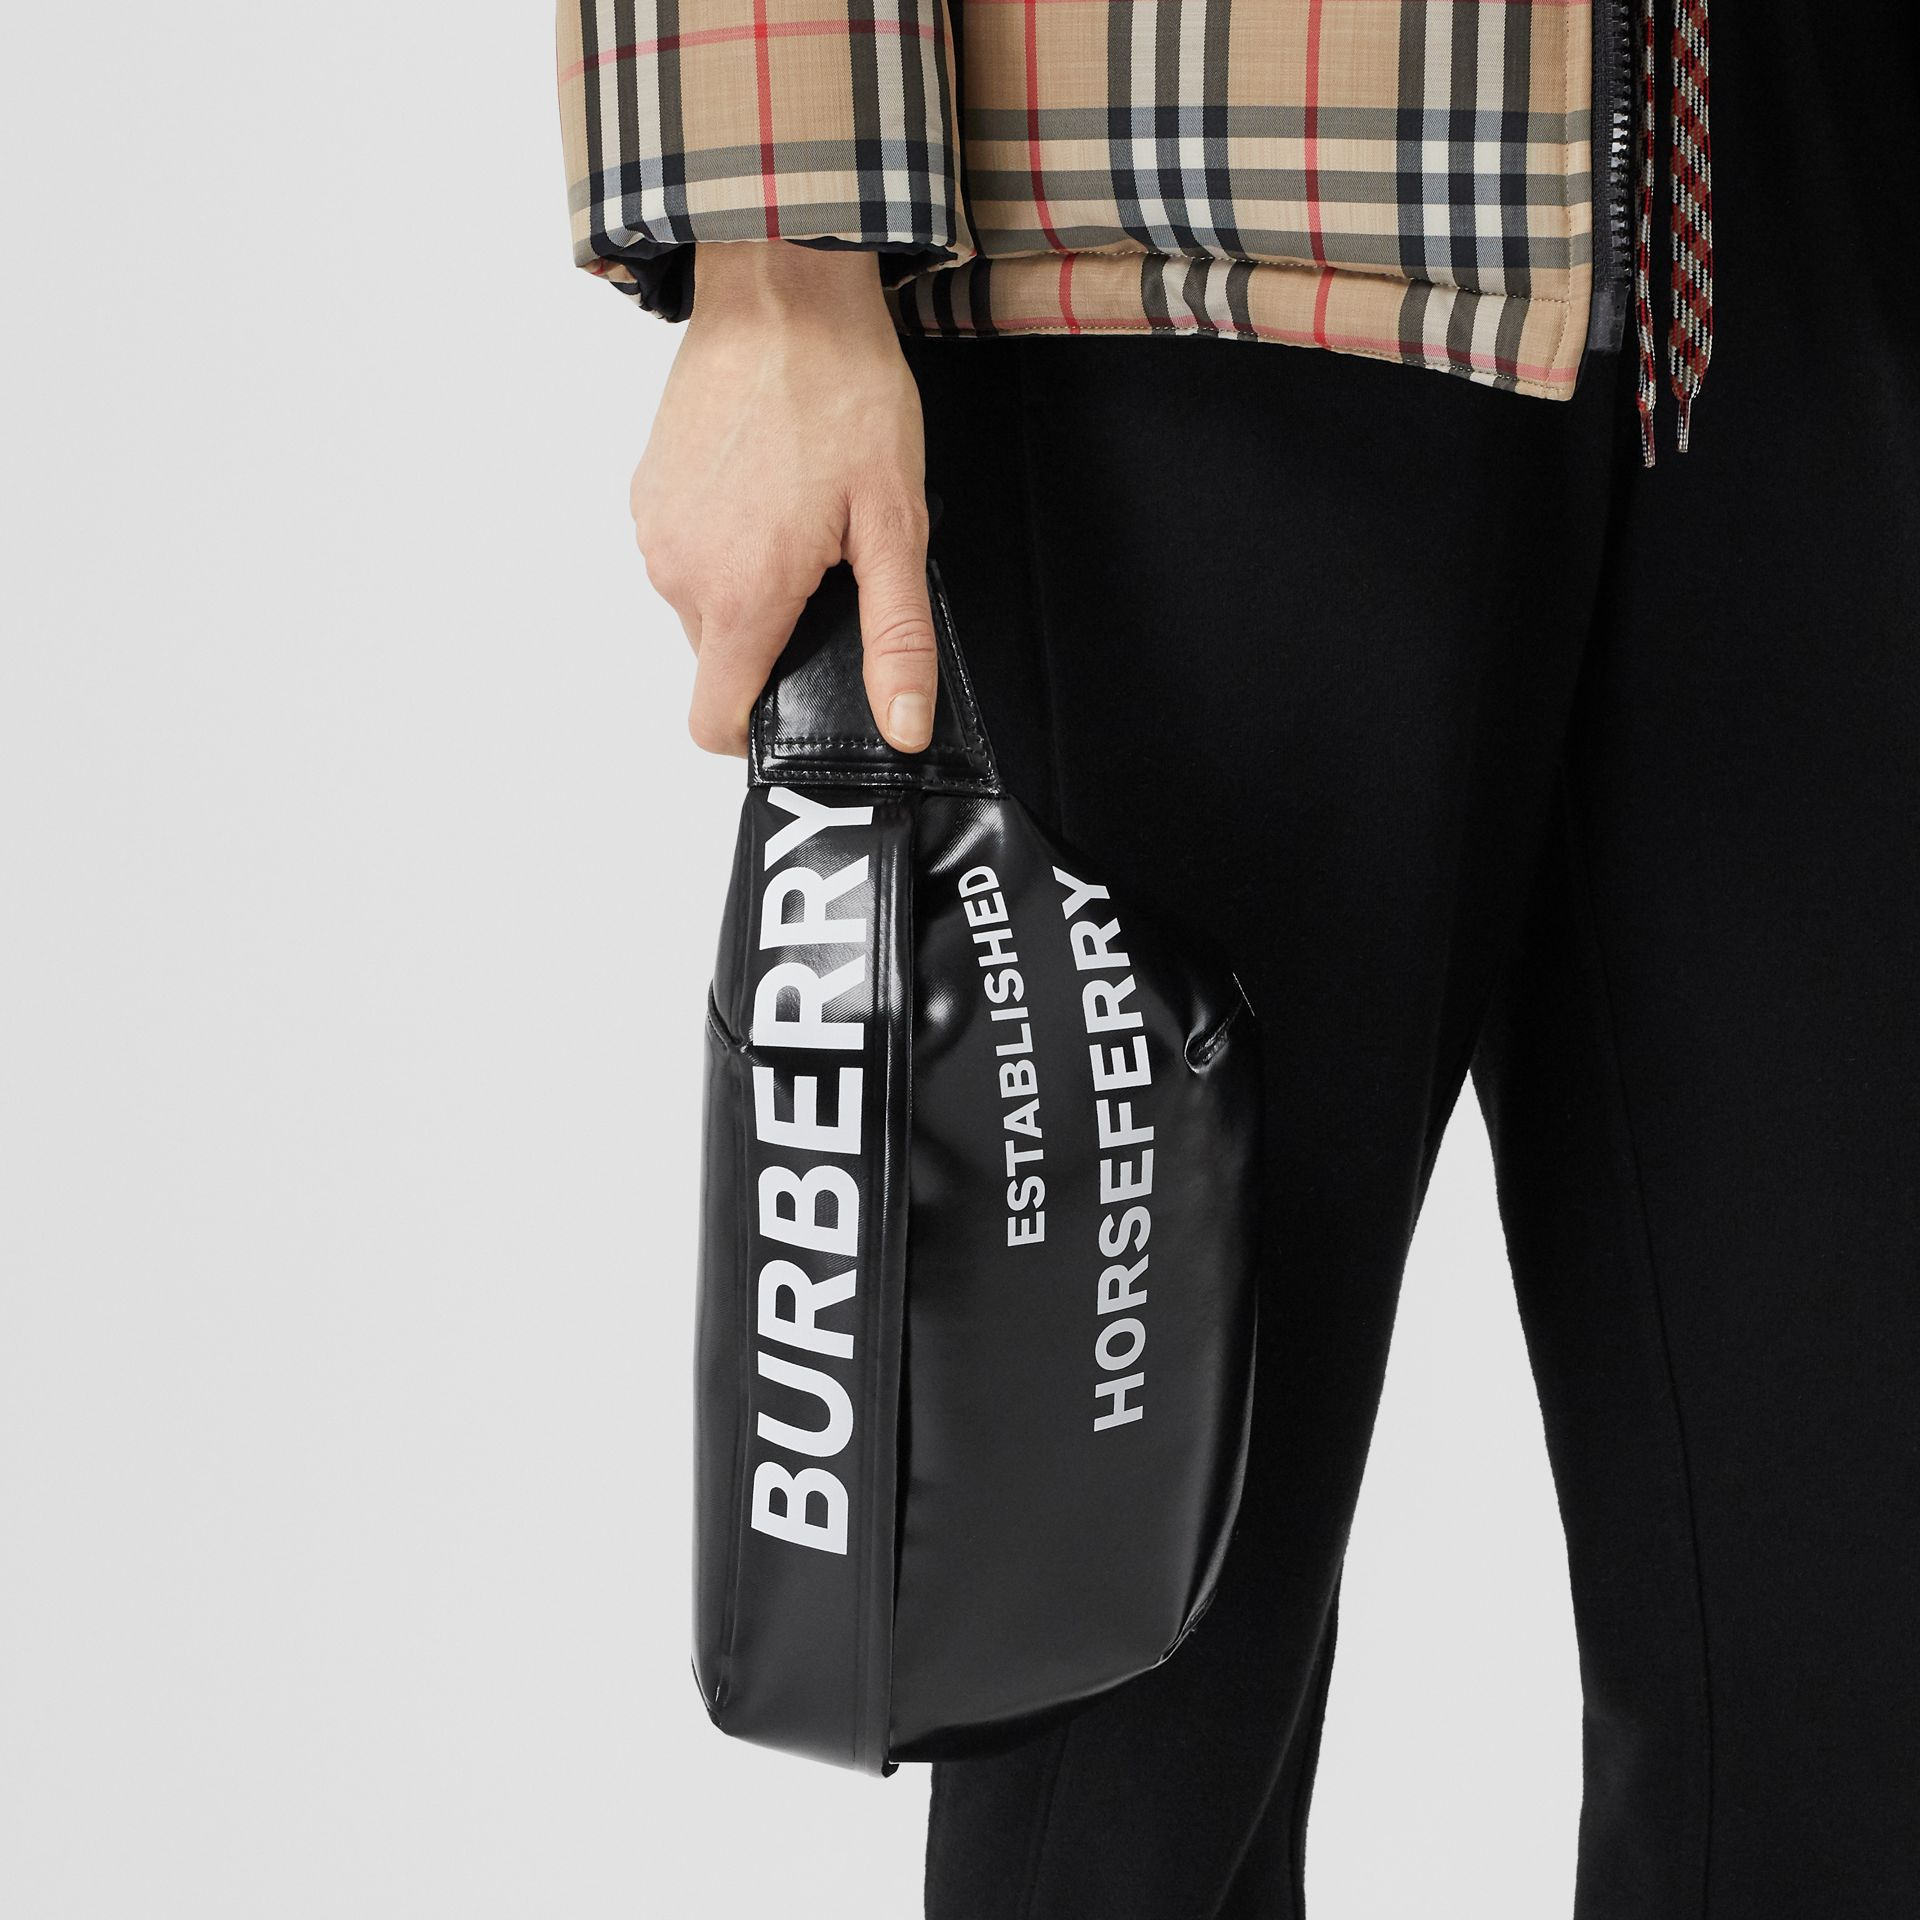 Medium Horseferry Print Bum Bag in Black | Burberry Australia - gallery image 2